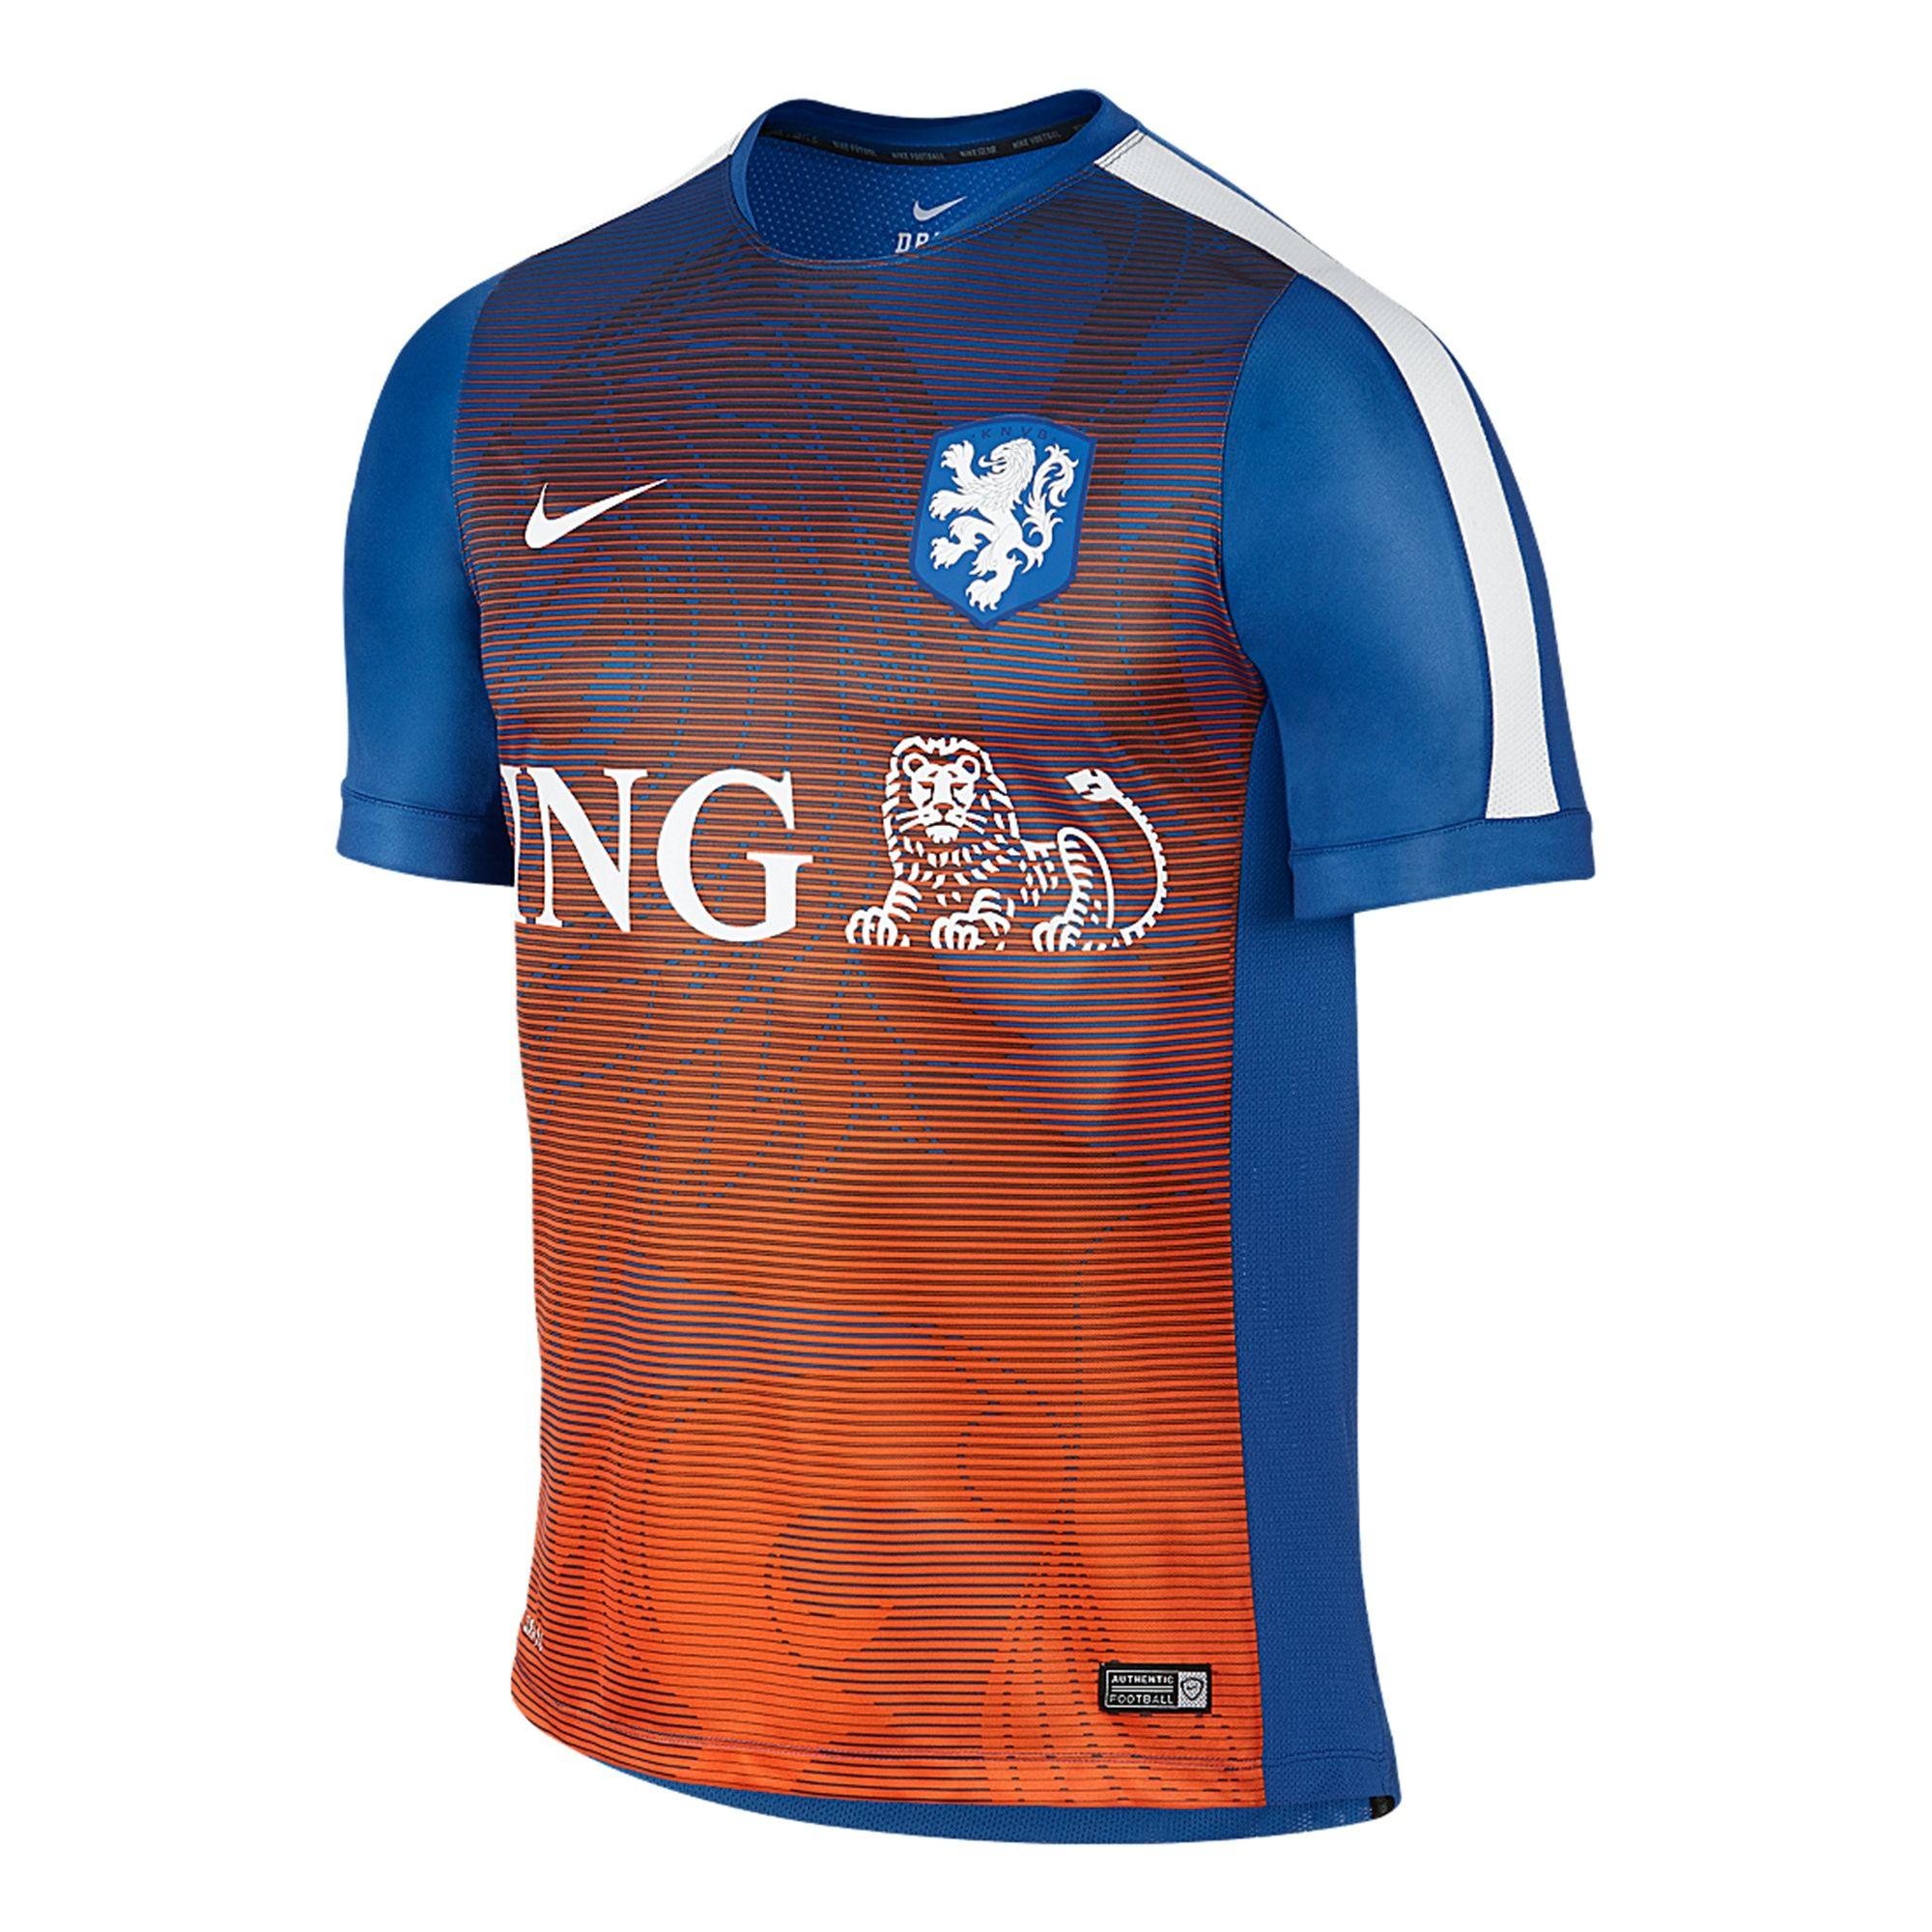 Seleccione La base de datos contenido  Camisa Nike Holanda Pré-Jogo Masculina - Nike no Nike.com.br | Camisetas de  equipo, Camisetas, Camisa de fútbol